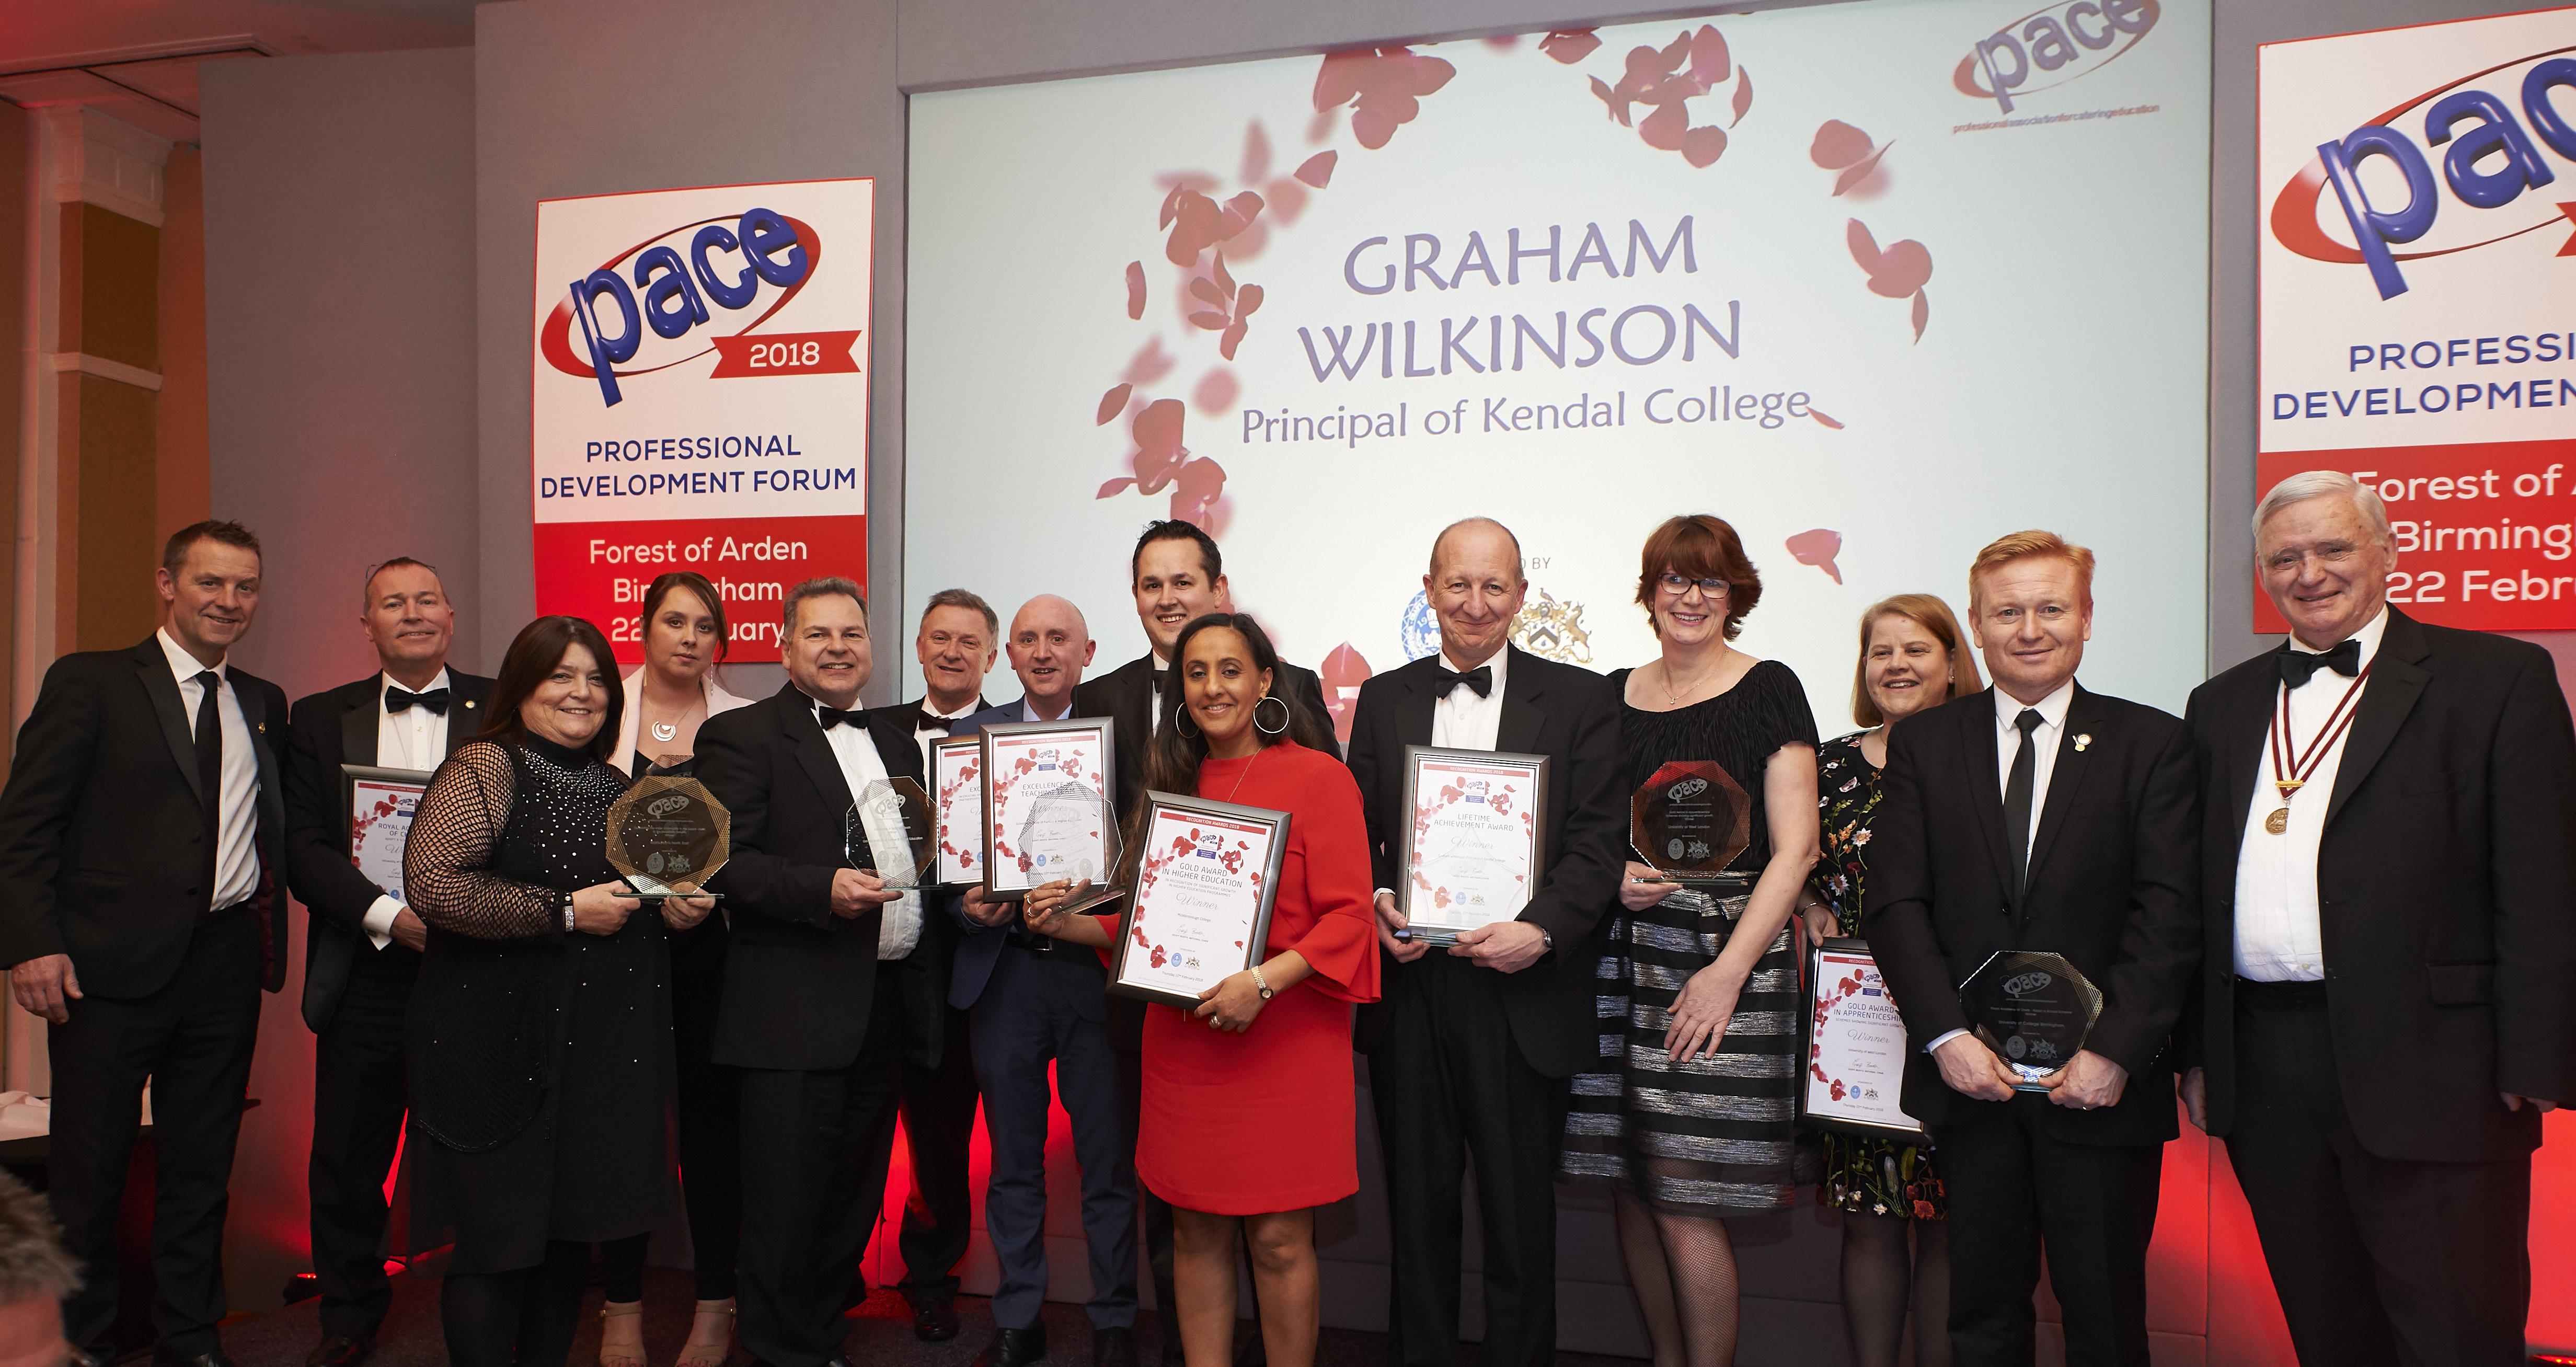 PACE 2018 Award Winners